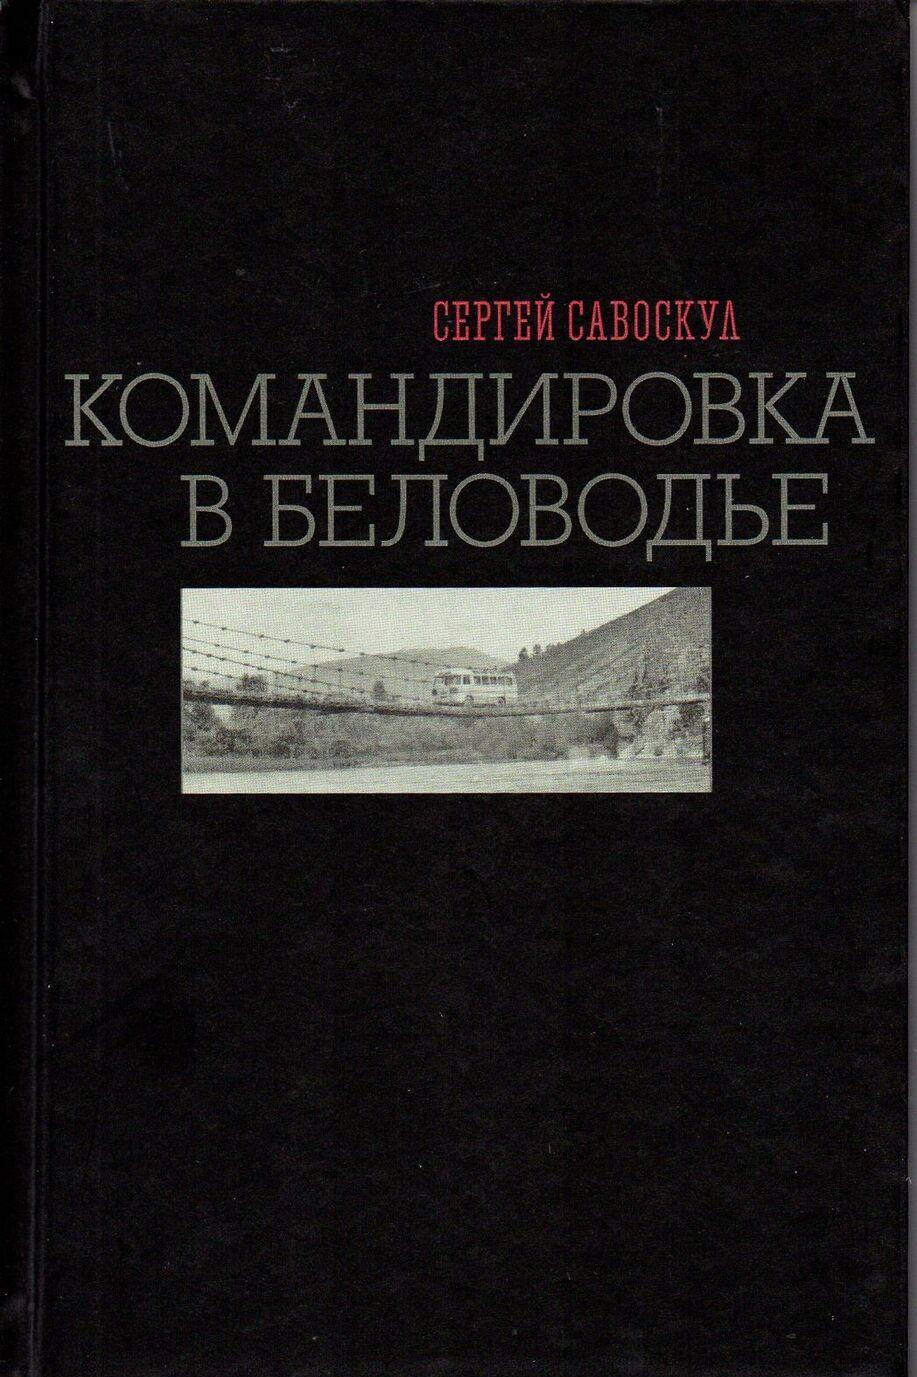 Komandirovka v Belovode